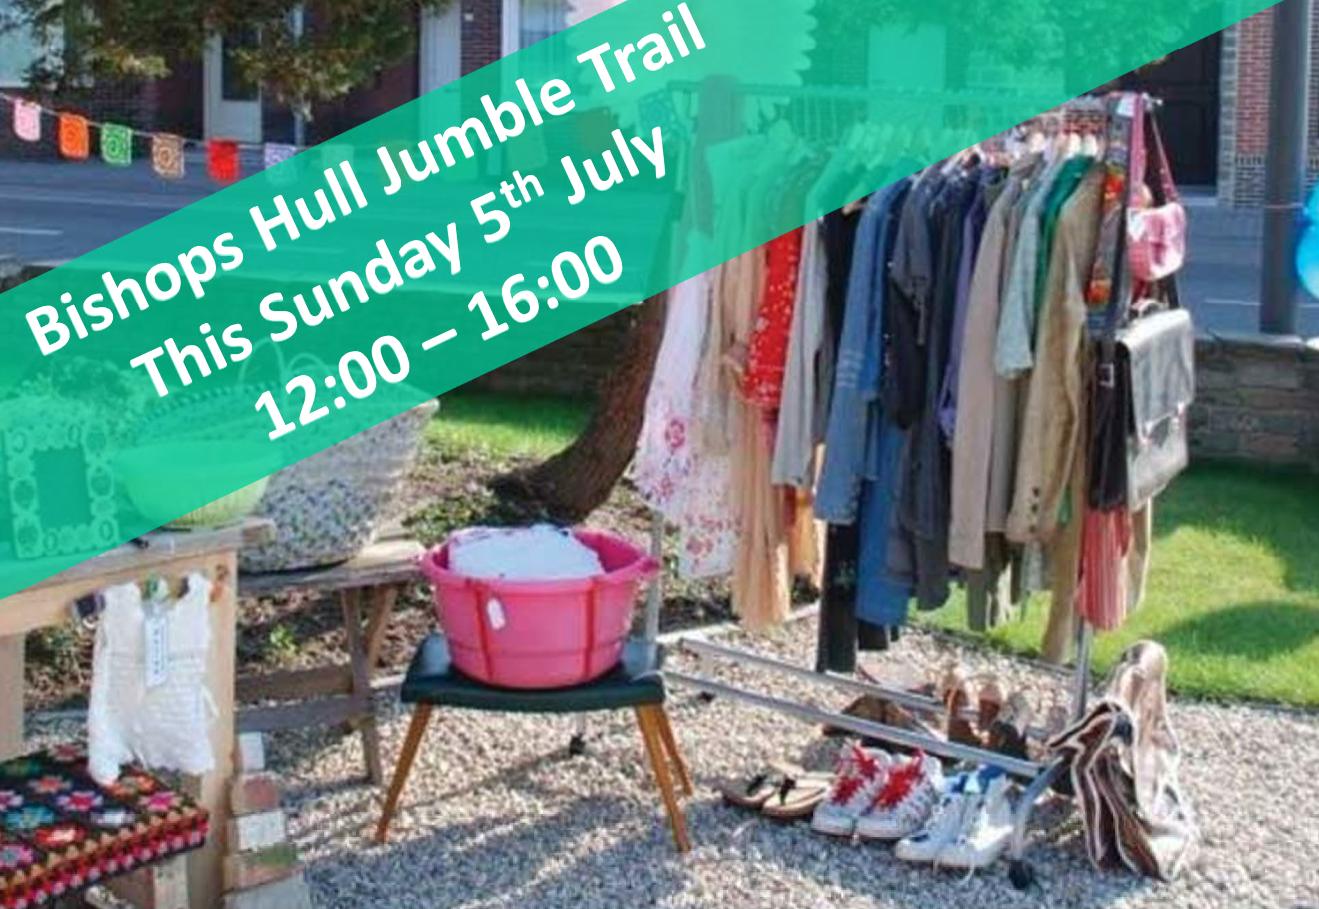 Village Jumble Trail